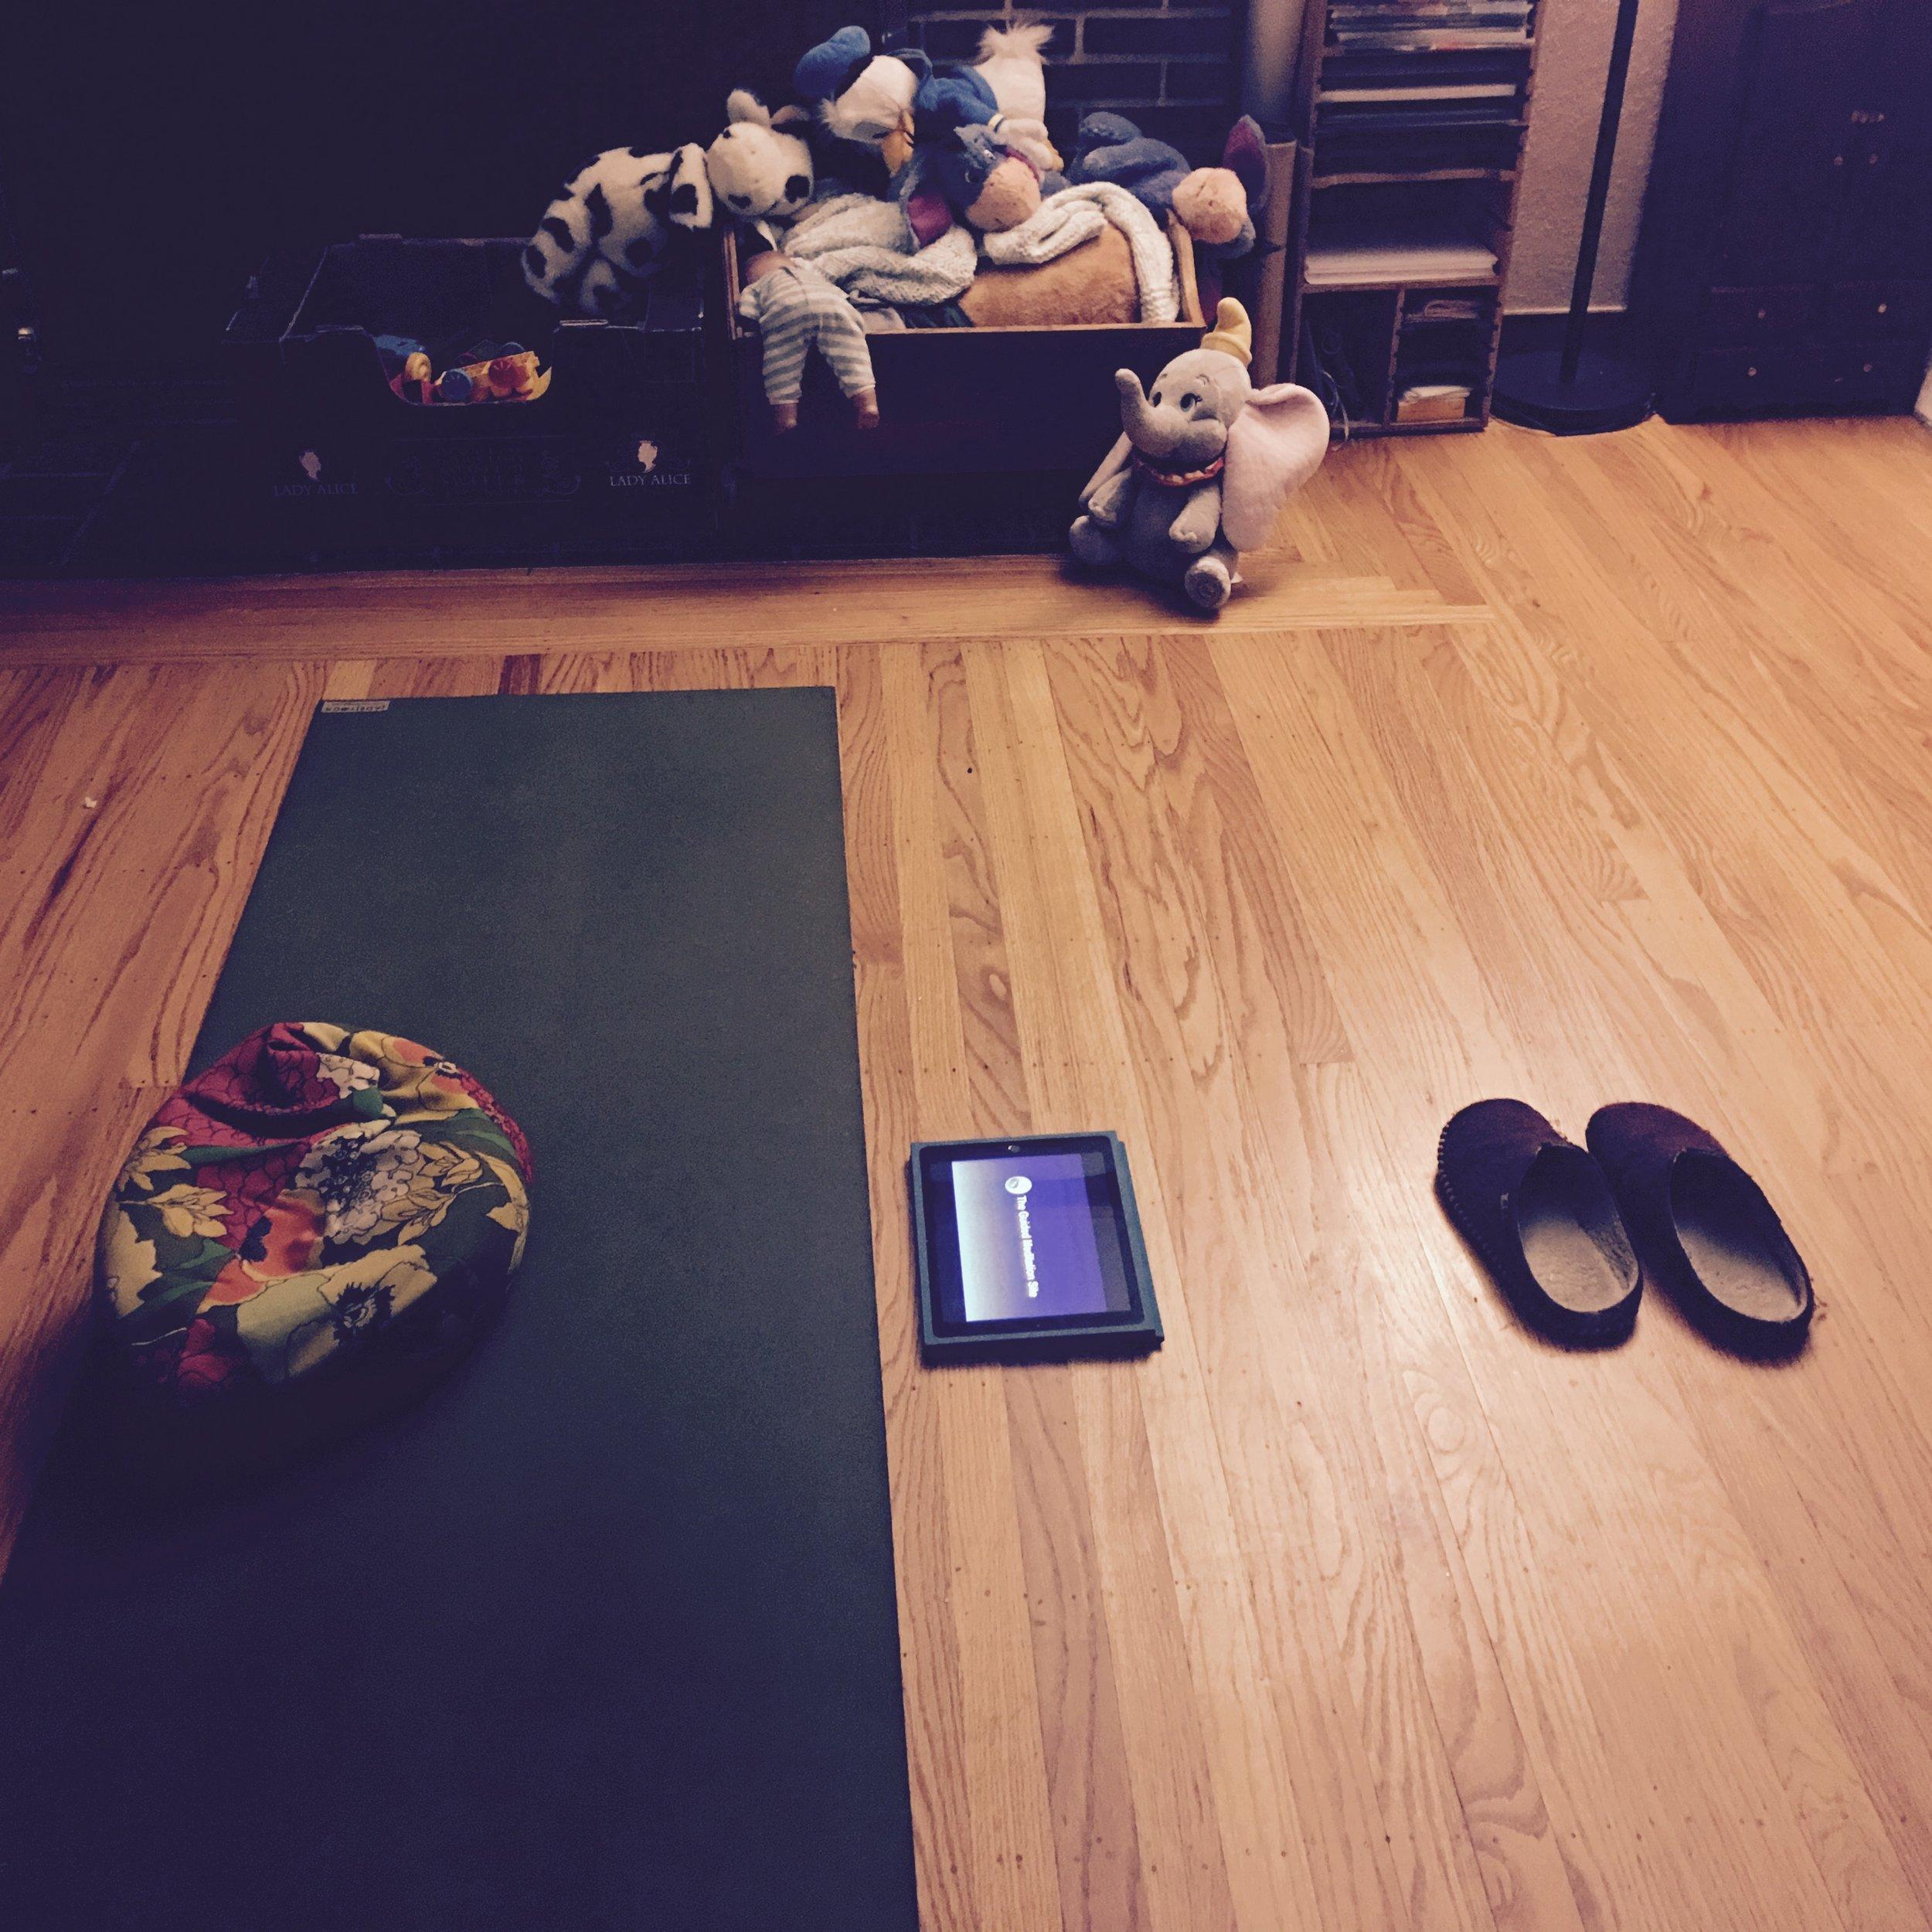 Making My Own Meditation Micro Habit